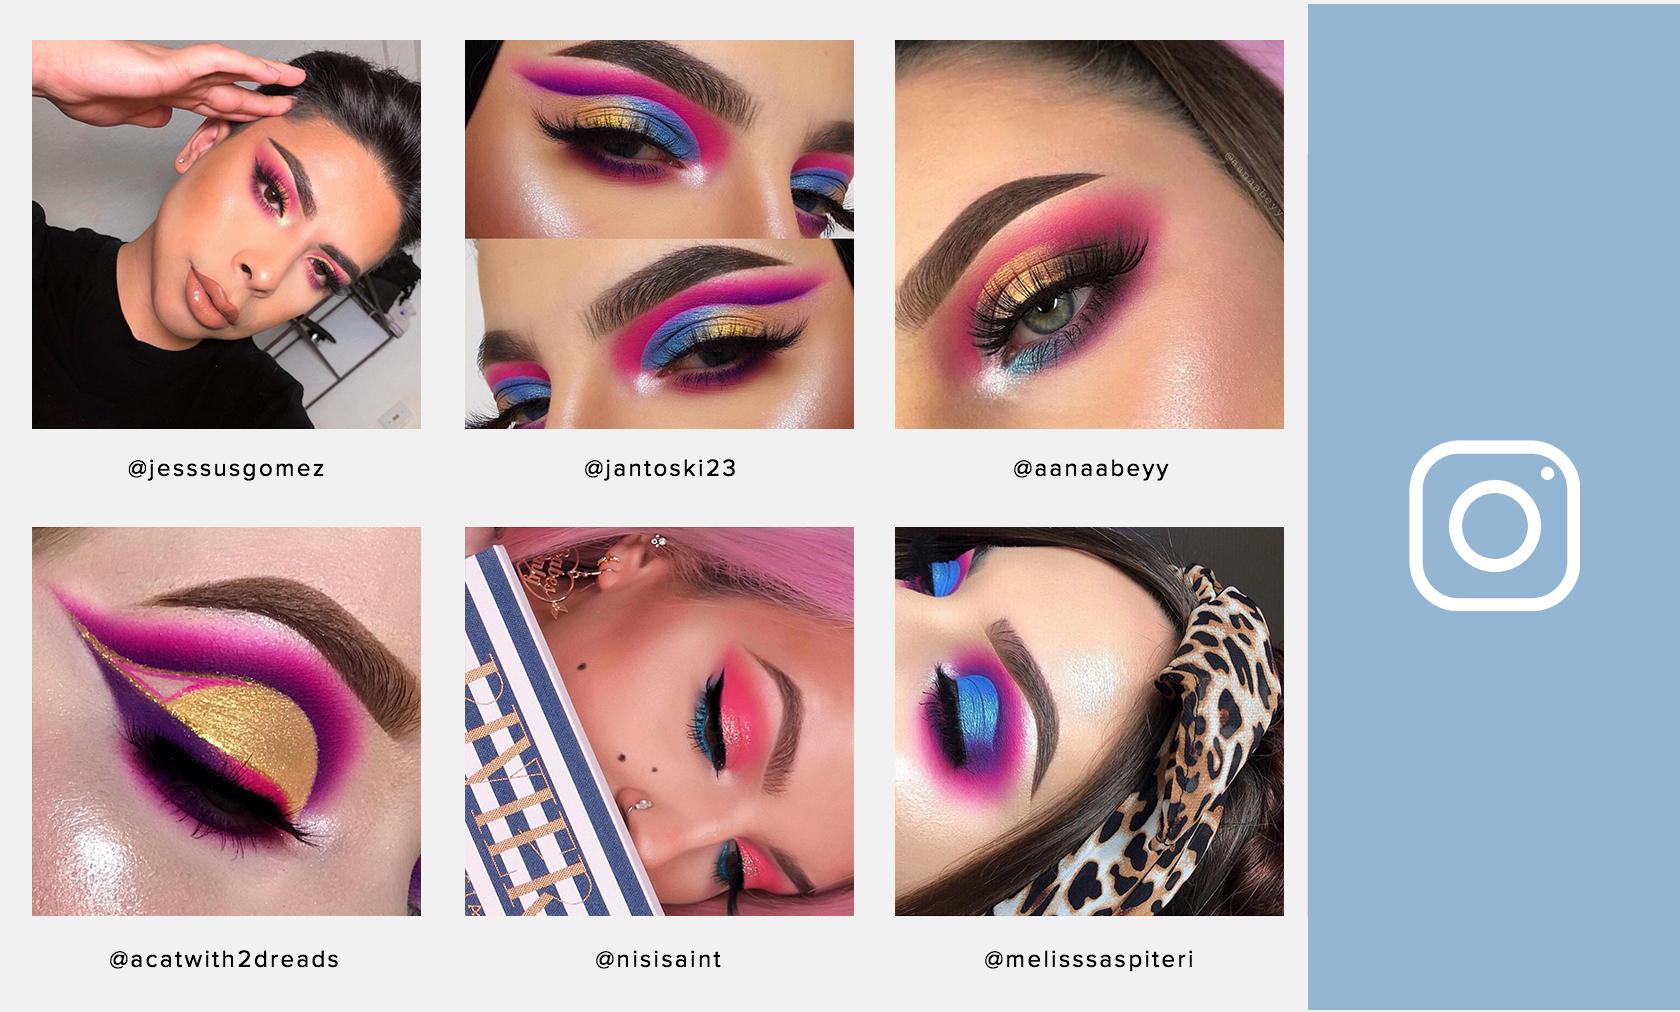 ABH Instagram Picks: @jesssusgomez, @jantoski23, @aanaabeyy, @acatwith2dreds, @nisisaint, @melisssapiteri